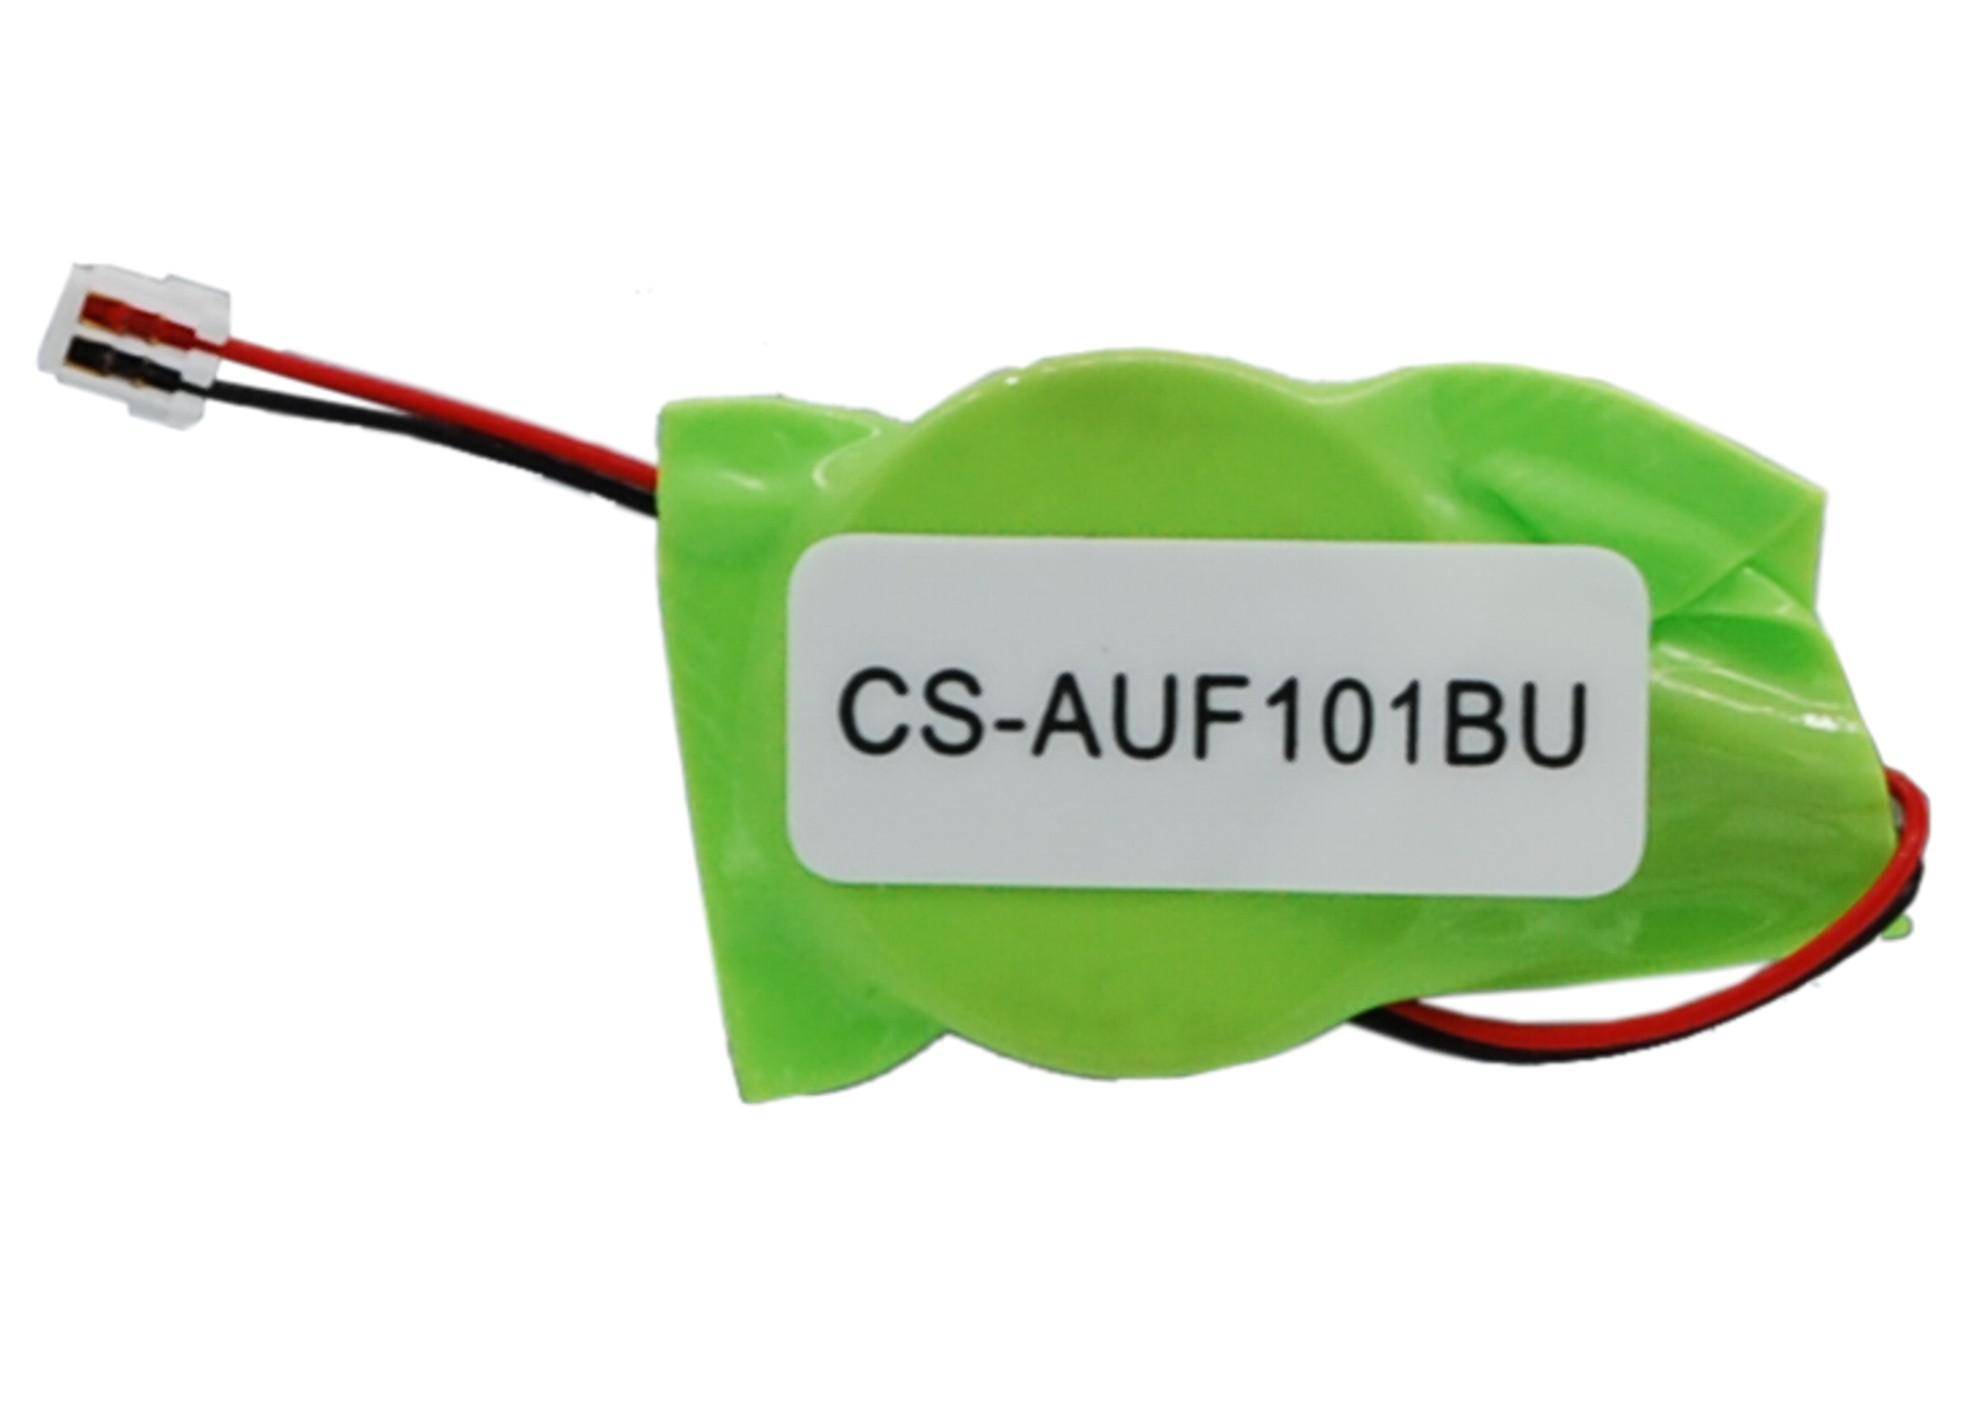 Cameron Sino baterie cmos pro ASUS Eee Pad Transformer TF101-1B186A 3V Li-ion 40mAh zelená - neoriginální